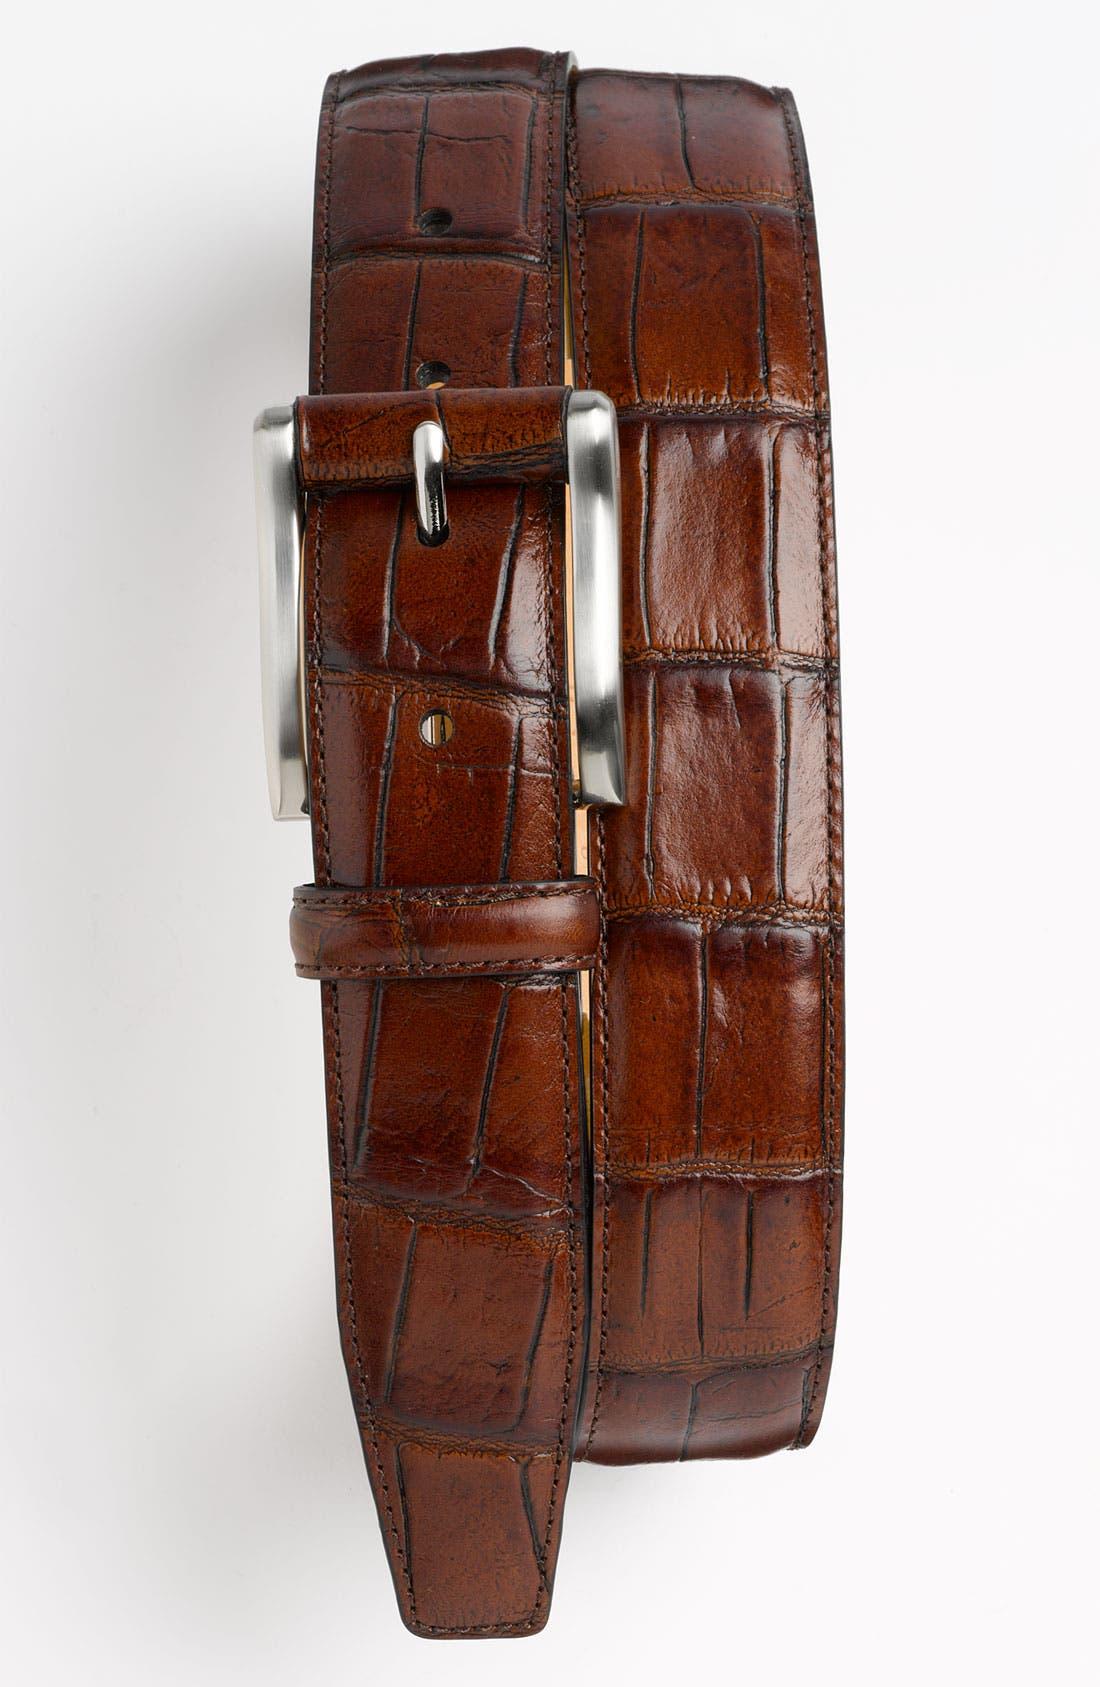 Alternate Image 1 Selected - Trafalgar 'Cambridge' Leather Belt